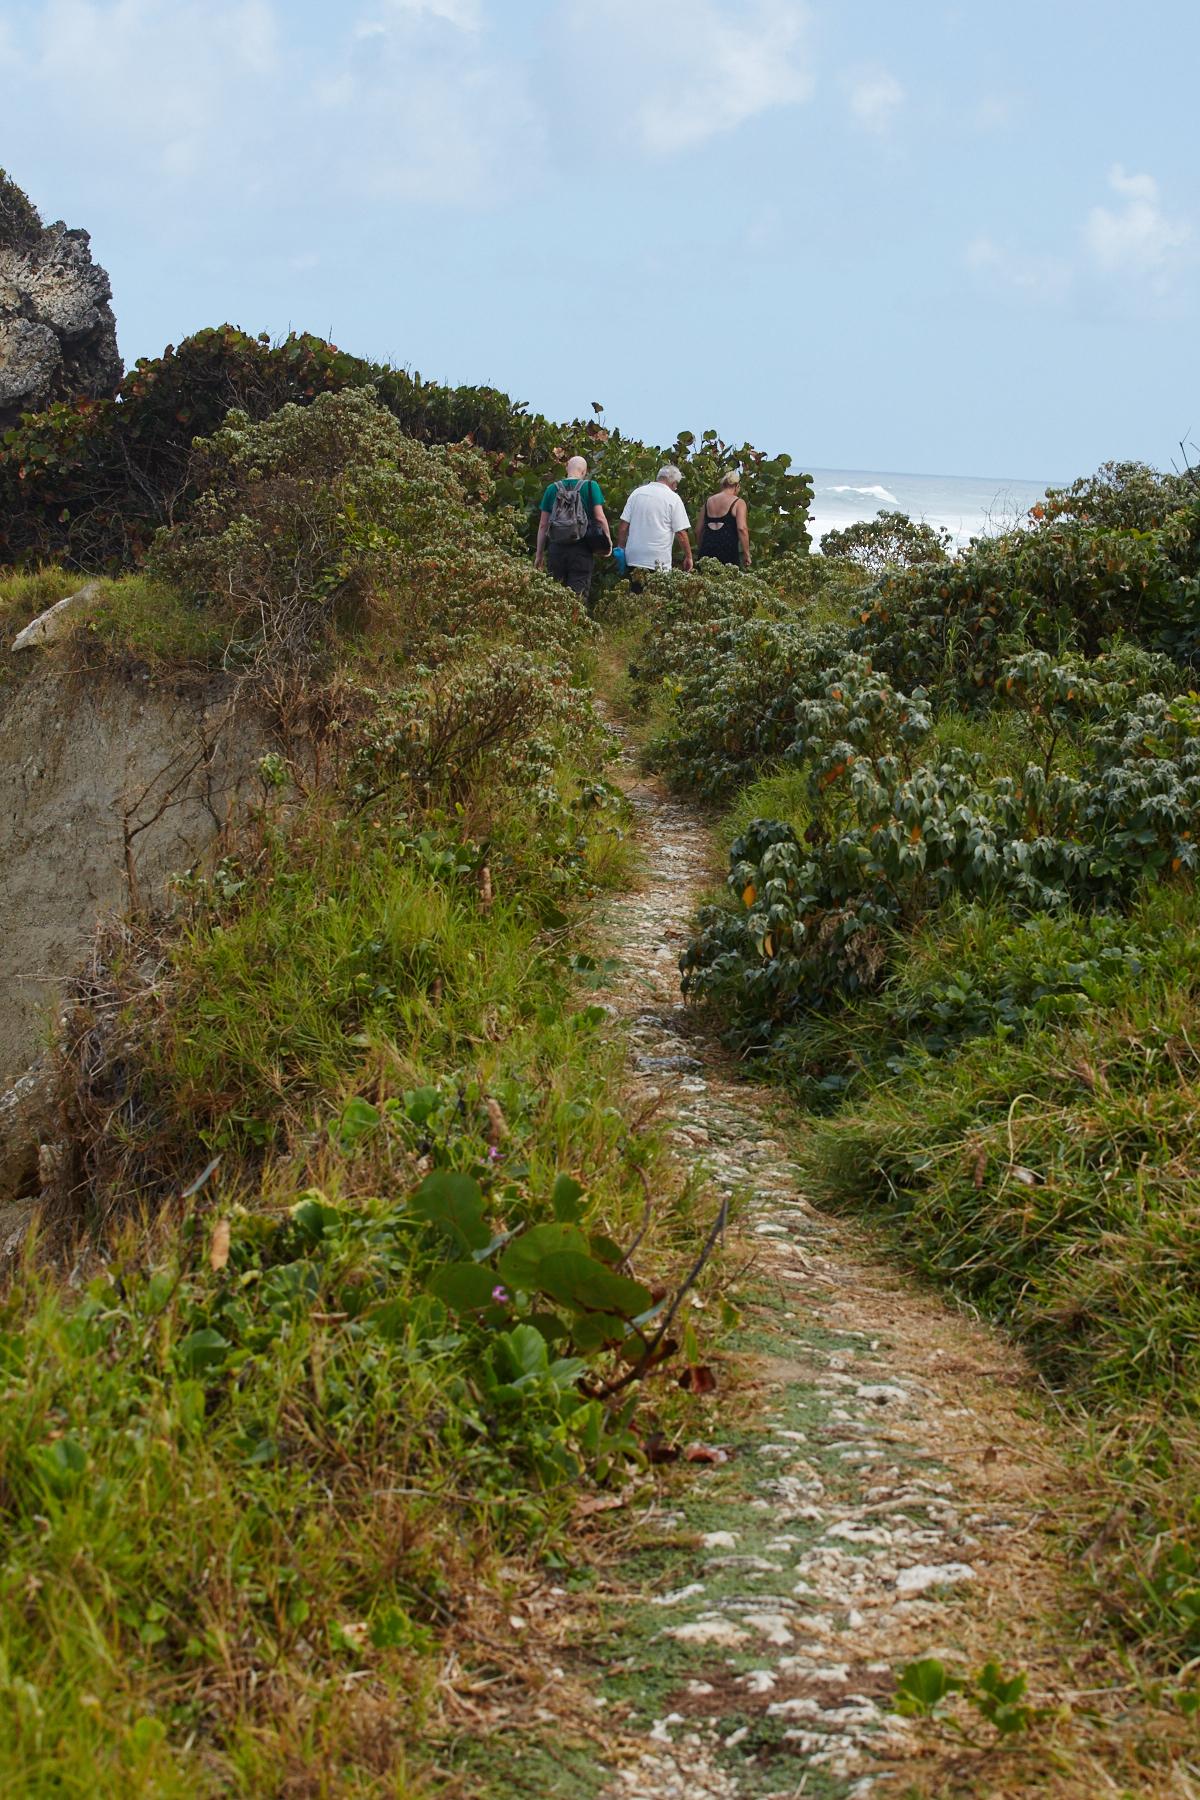 Tom, Jerry, and Joy walking along the ridge at Bathsheba